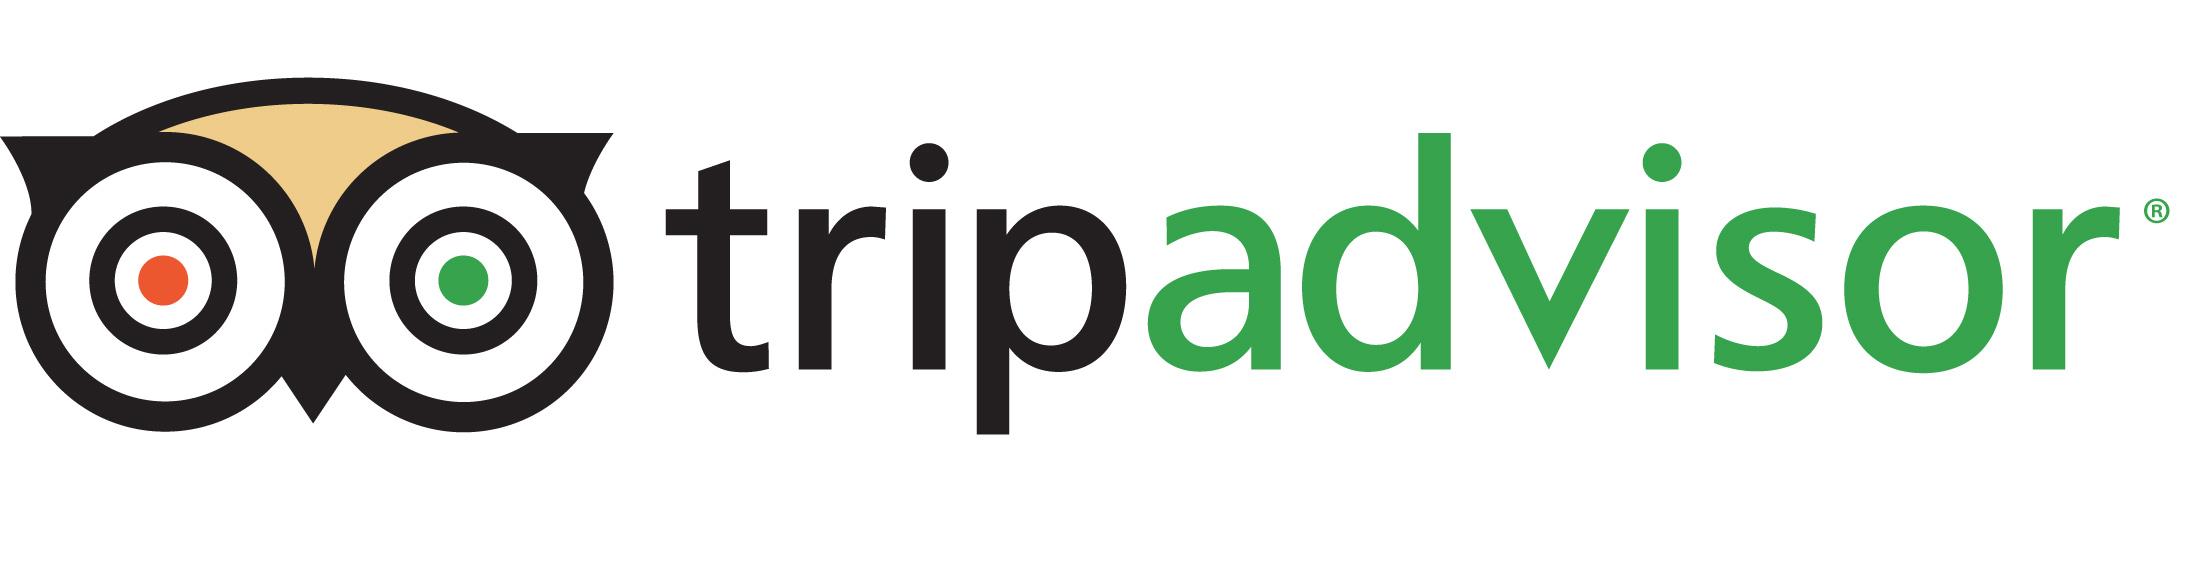 tripadvisor logo owl design